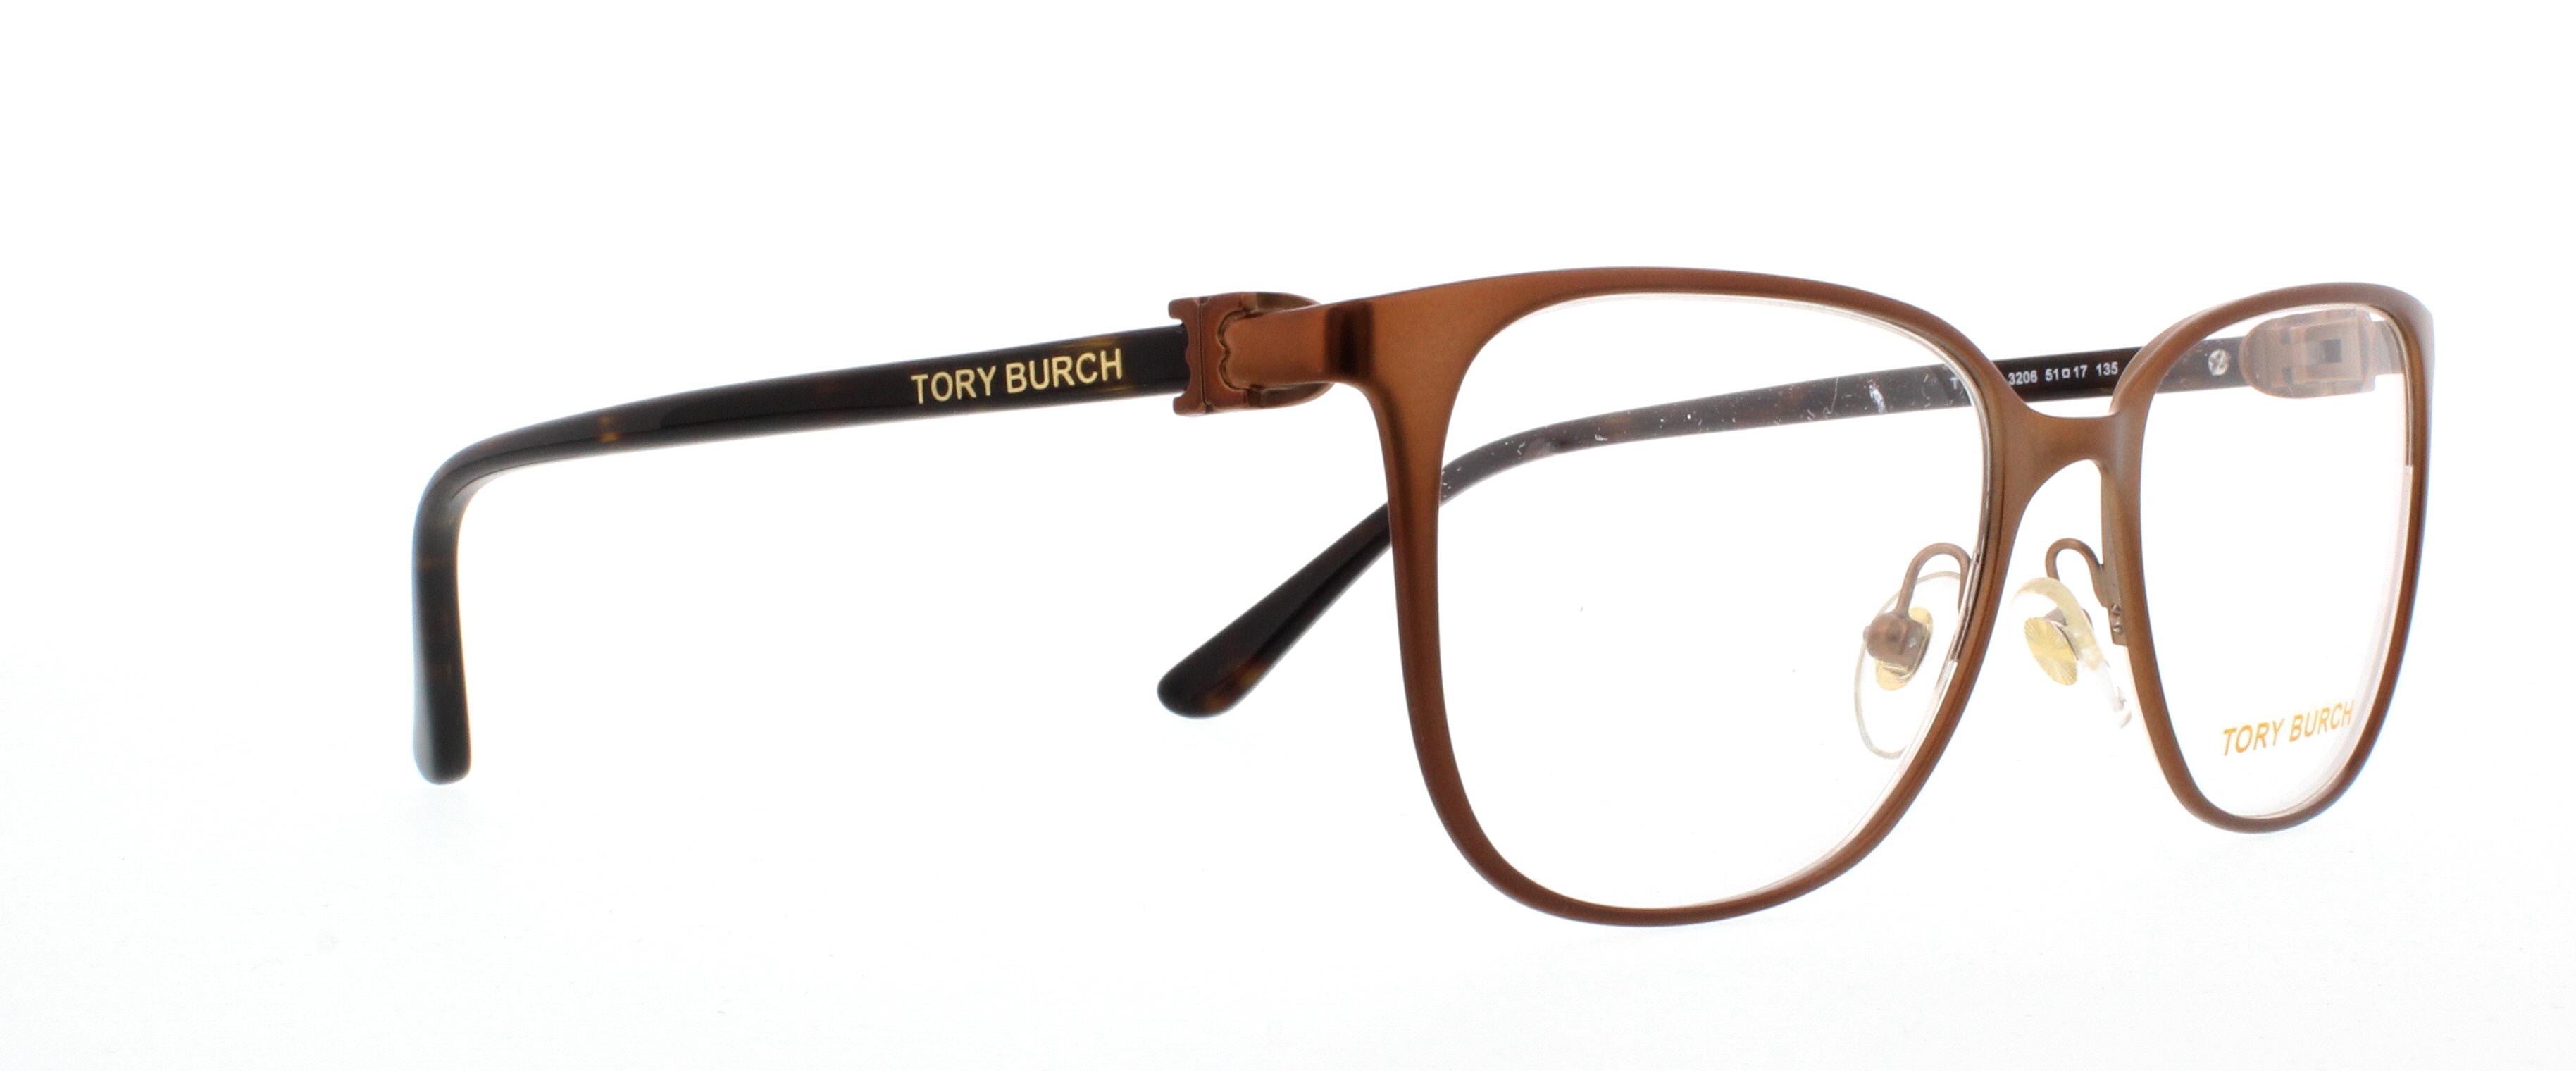 1b3706694dd2 Designer Frames Outlet. Tory Burch TY1053